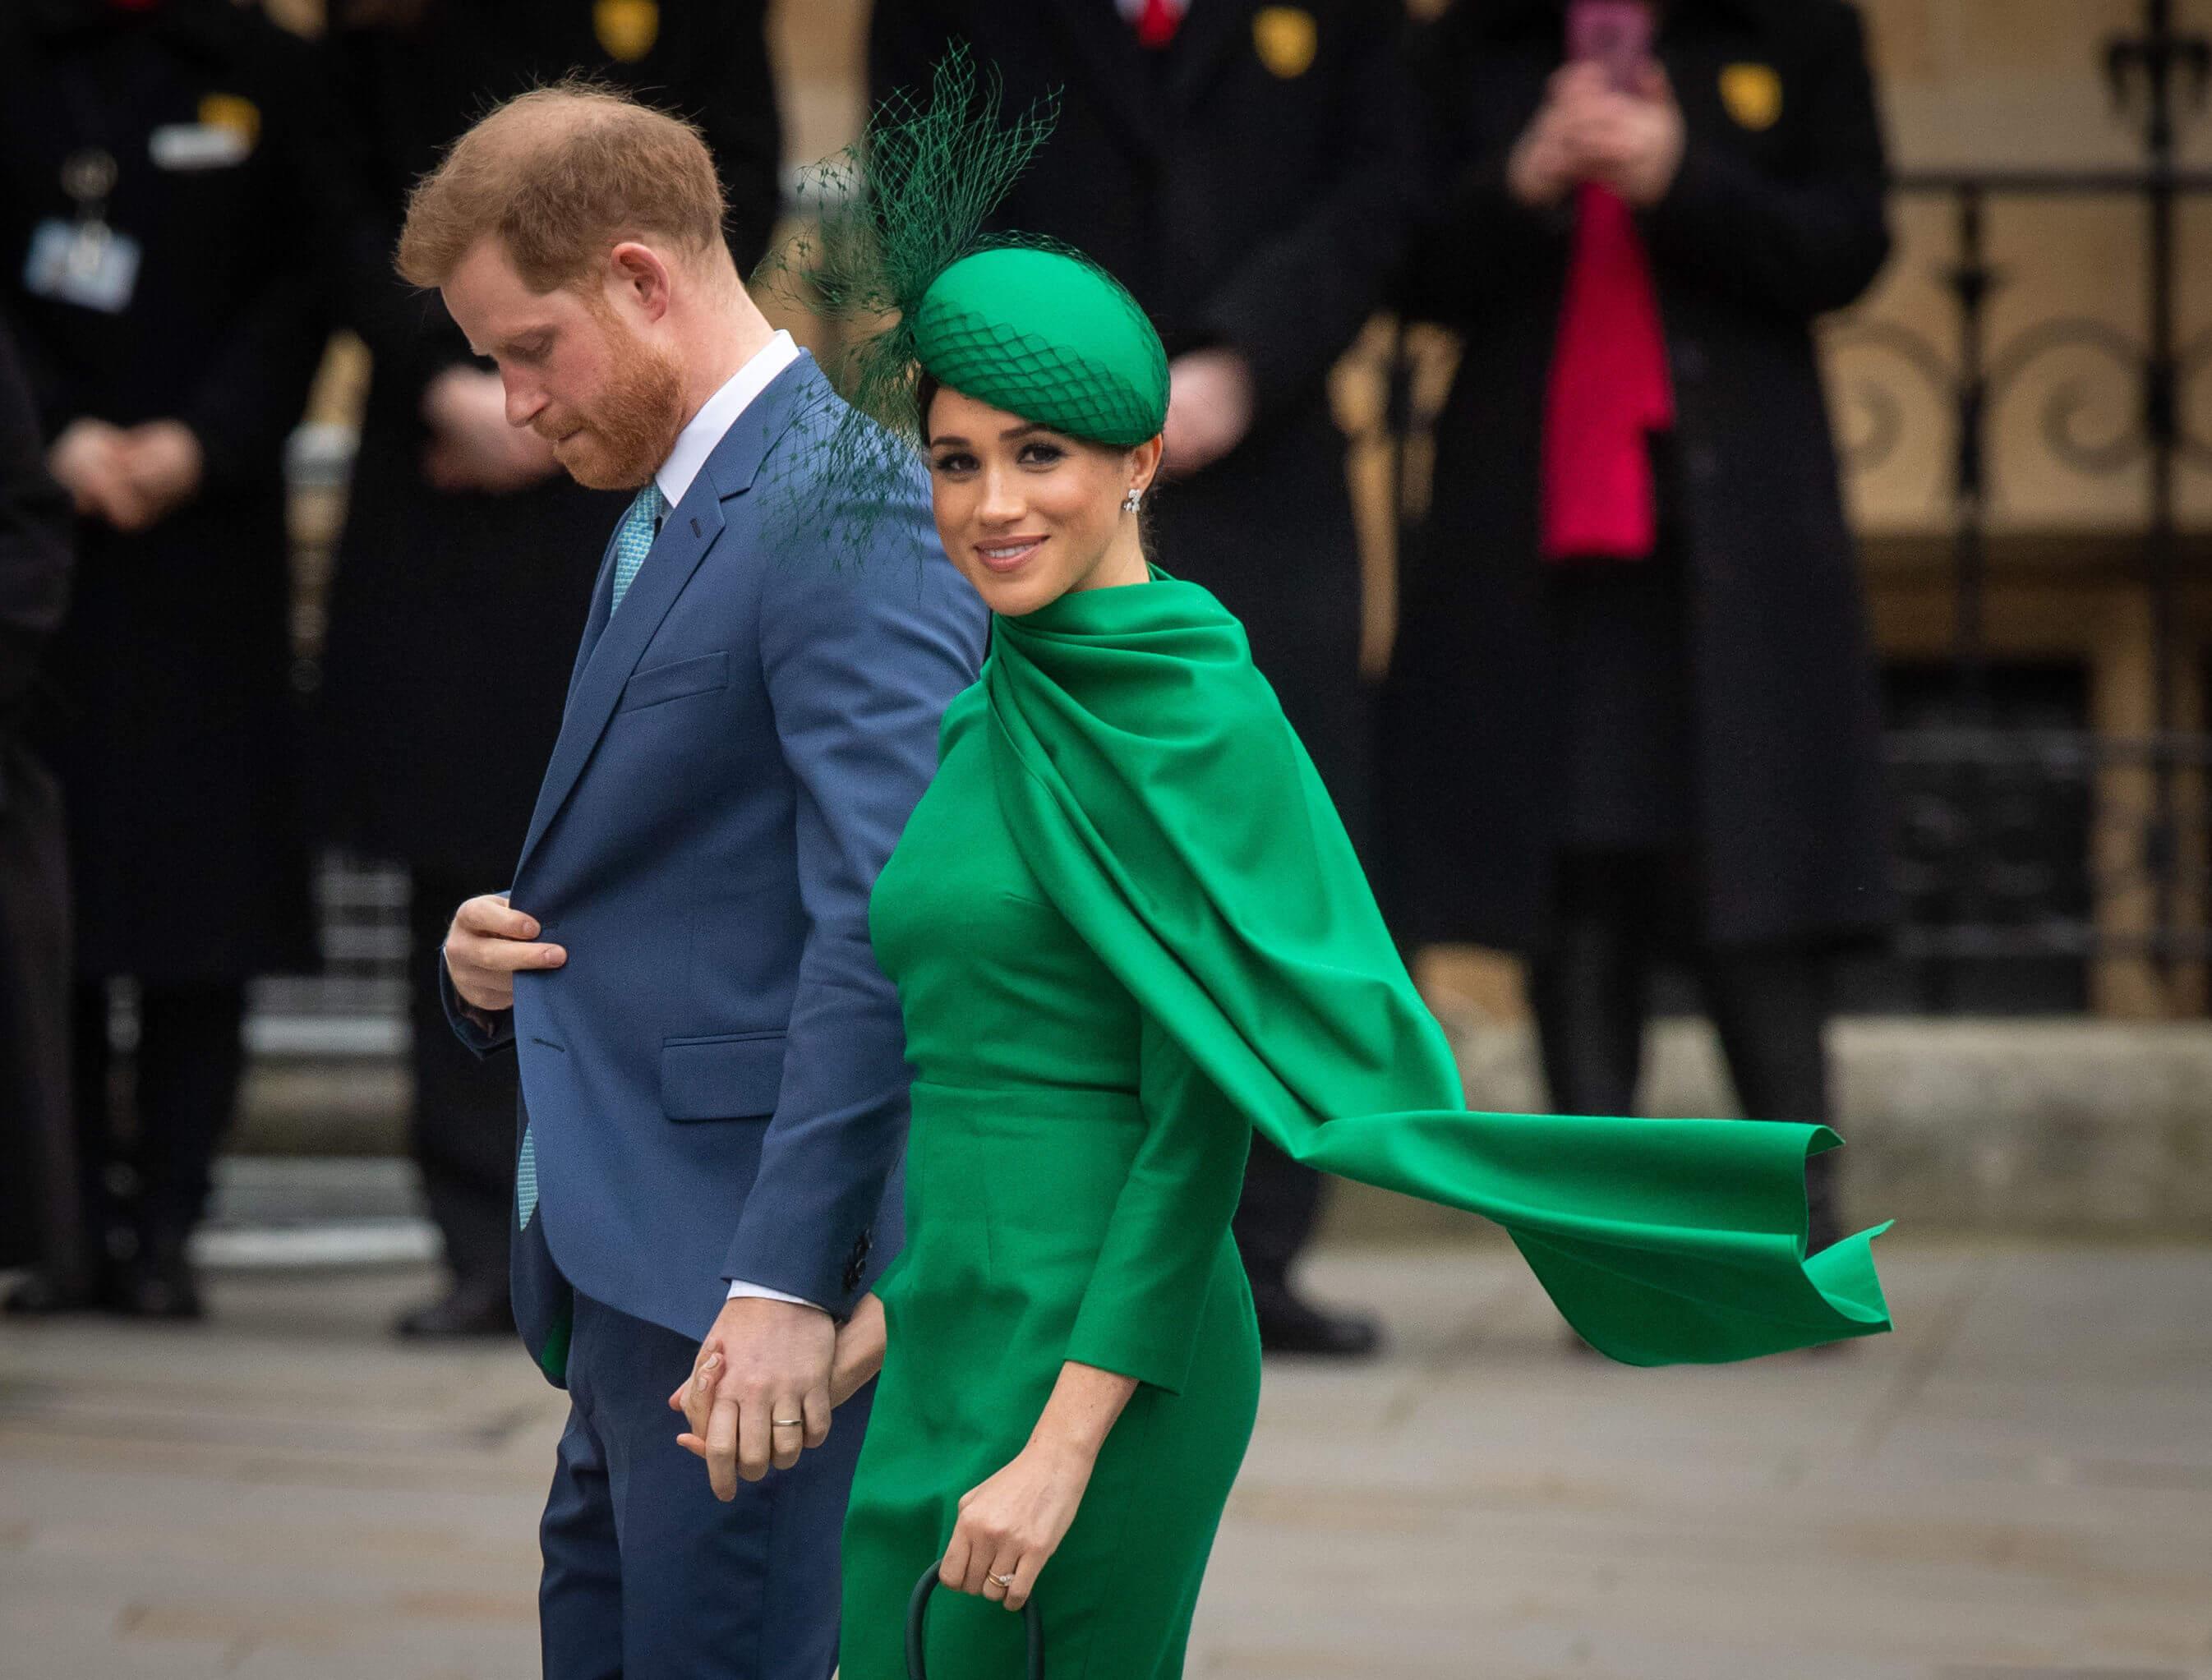 Königsfamilien Skandale 2020